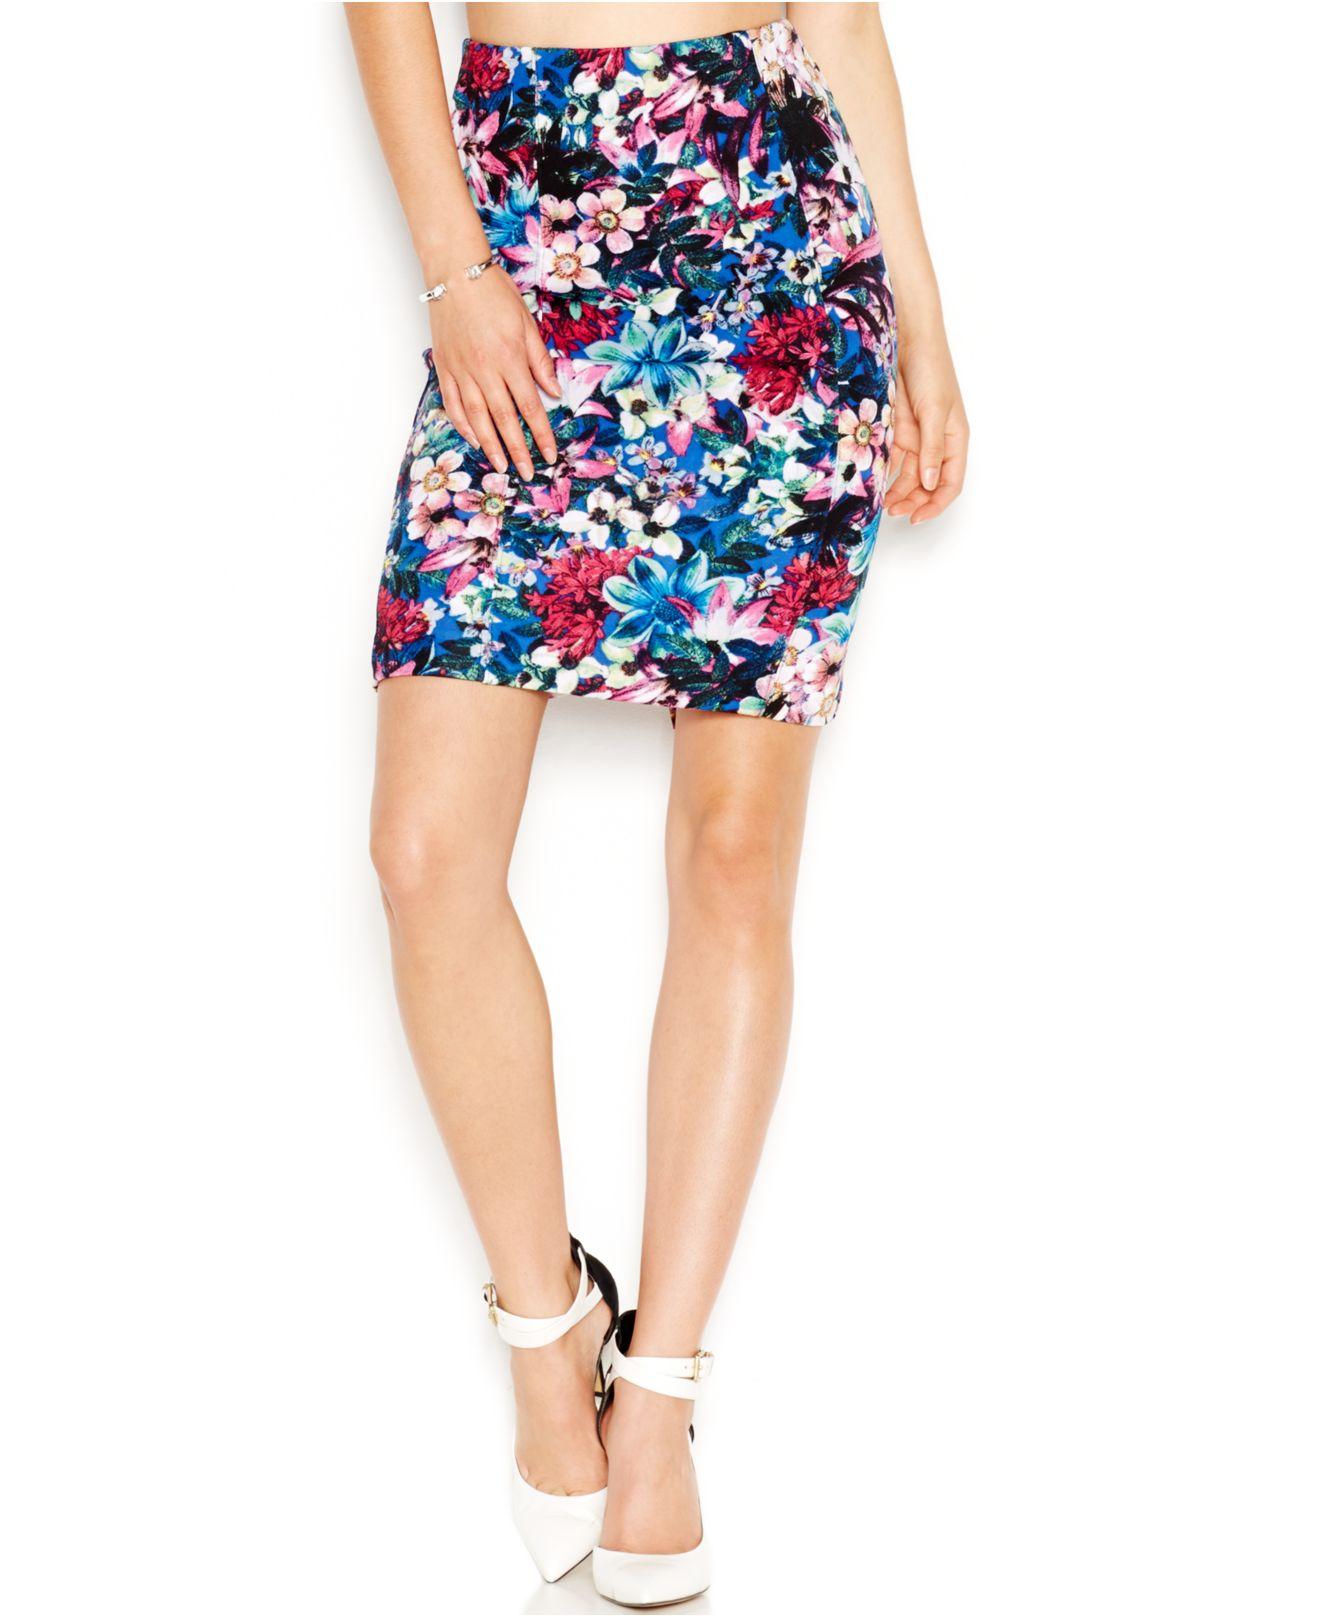 floral pencil skirt - photo #27